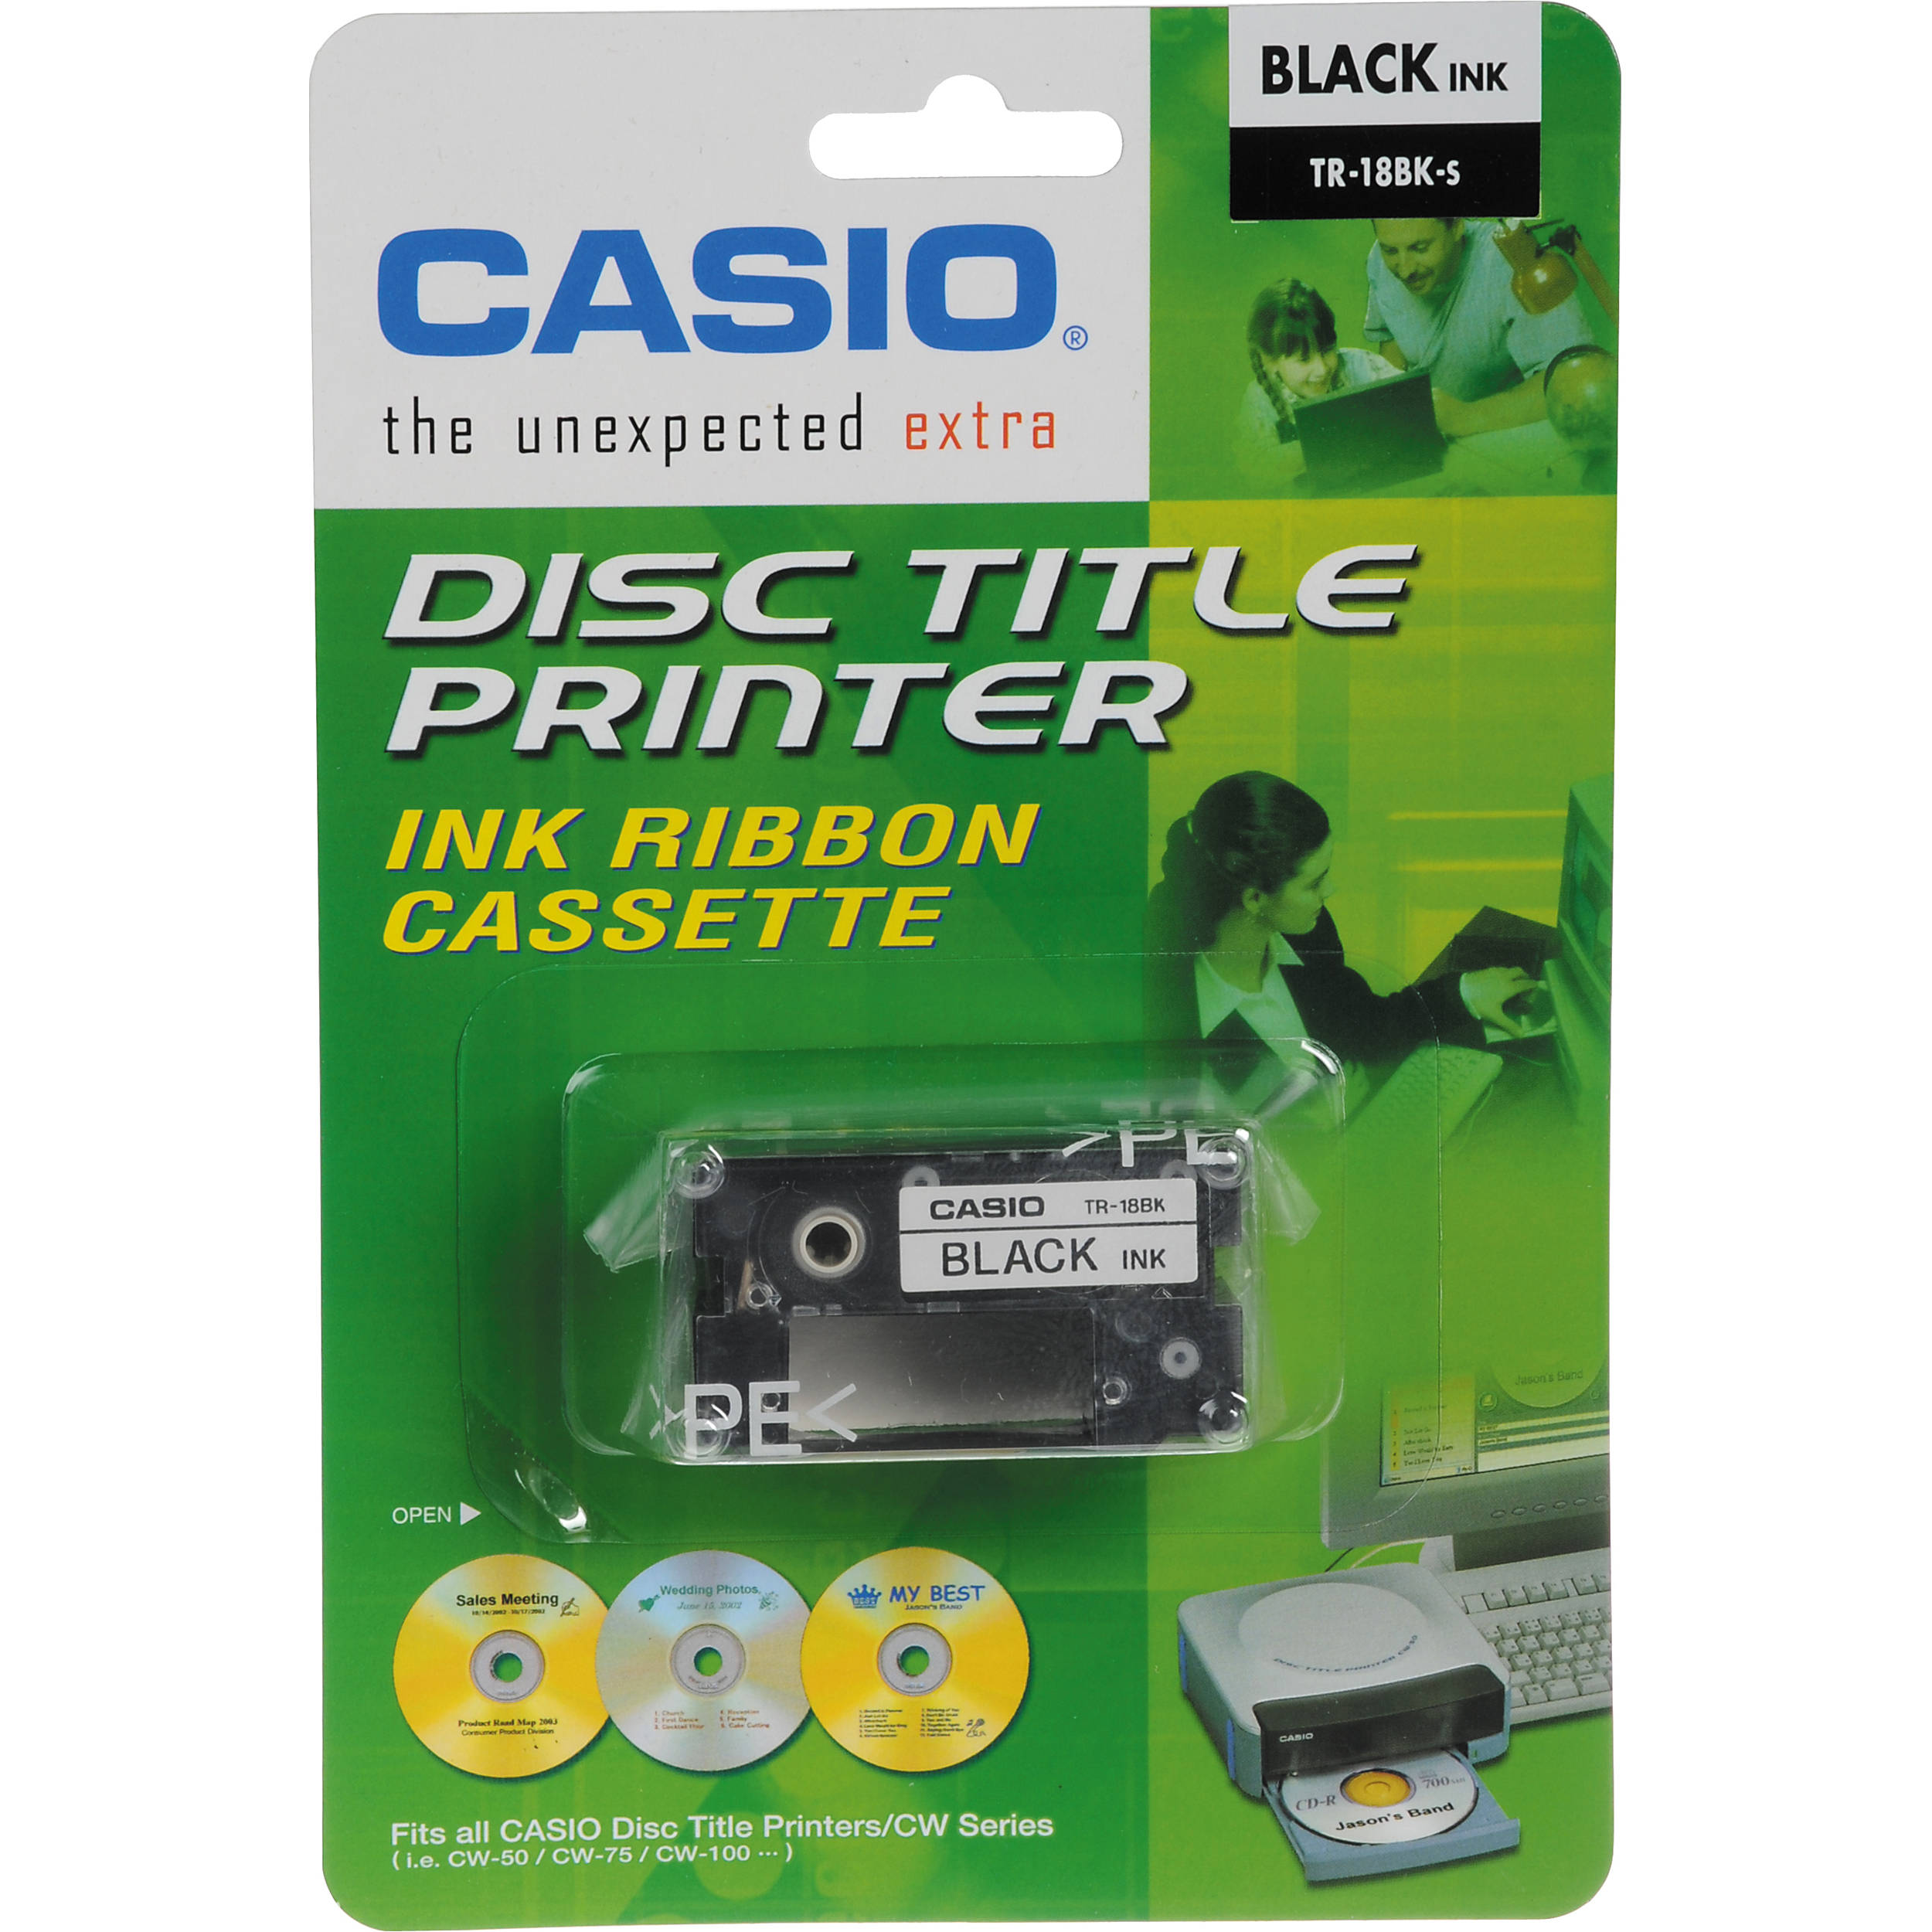 CASIO CW 75 WINDOWS 7 X64 DRIVER